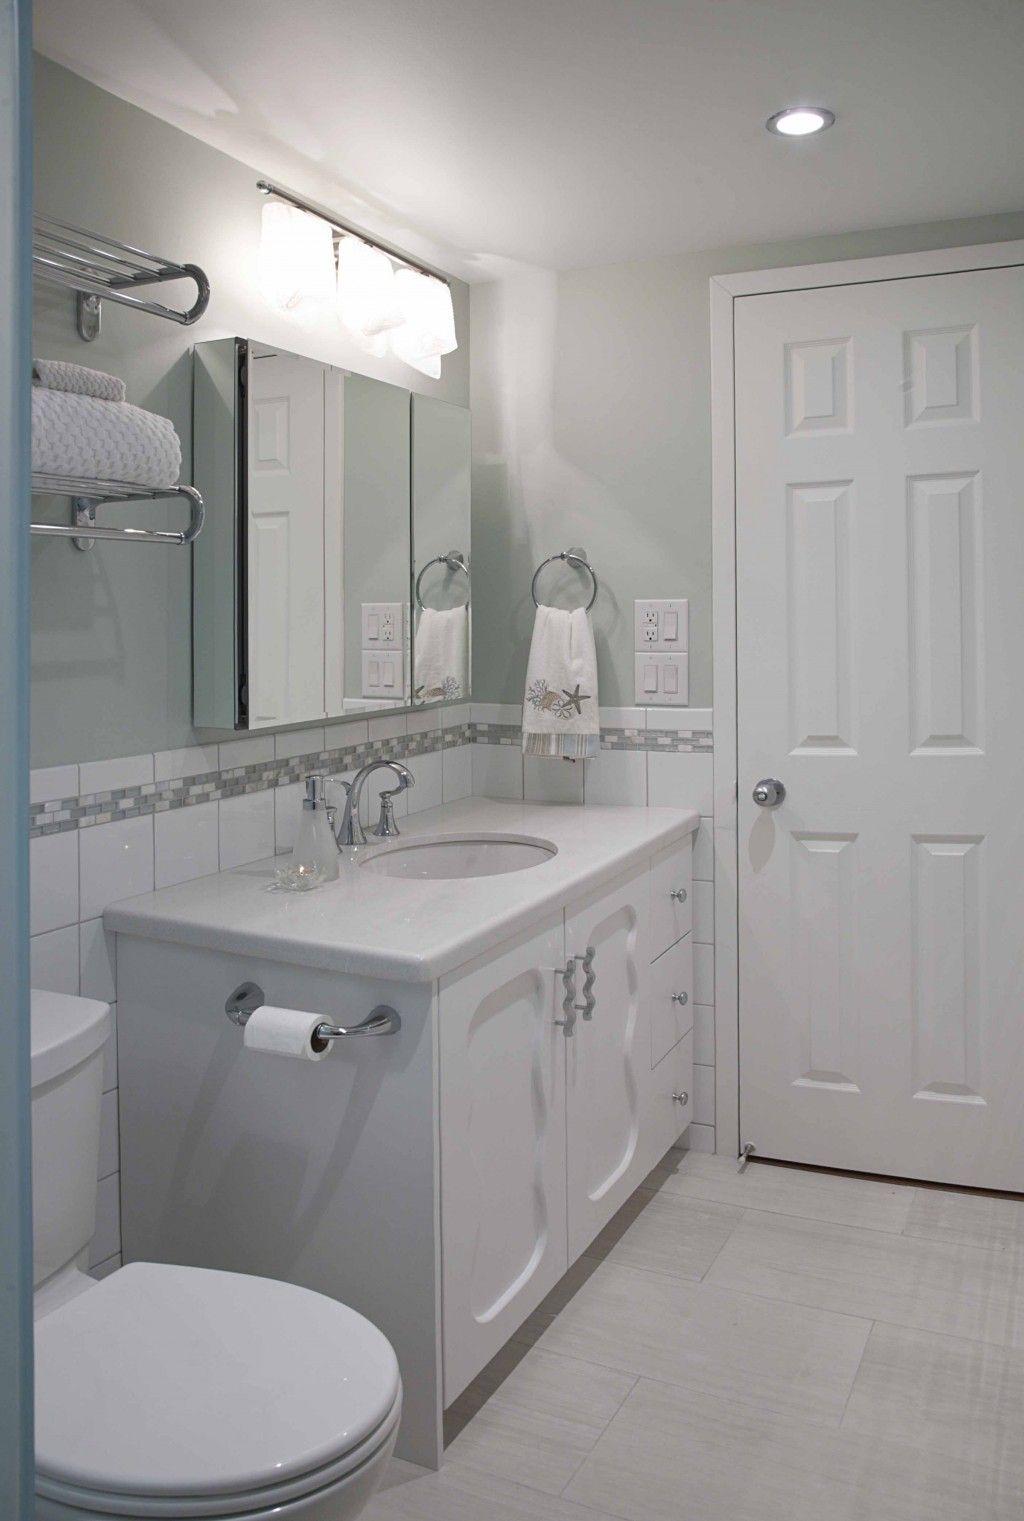 Narrow Bathroom Vanity With Modern Narrow Vanities With Single